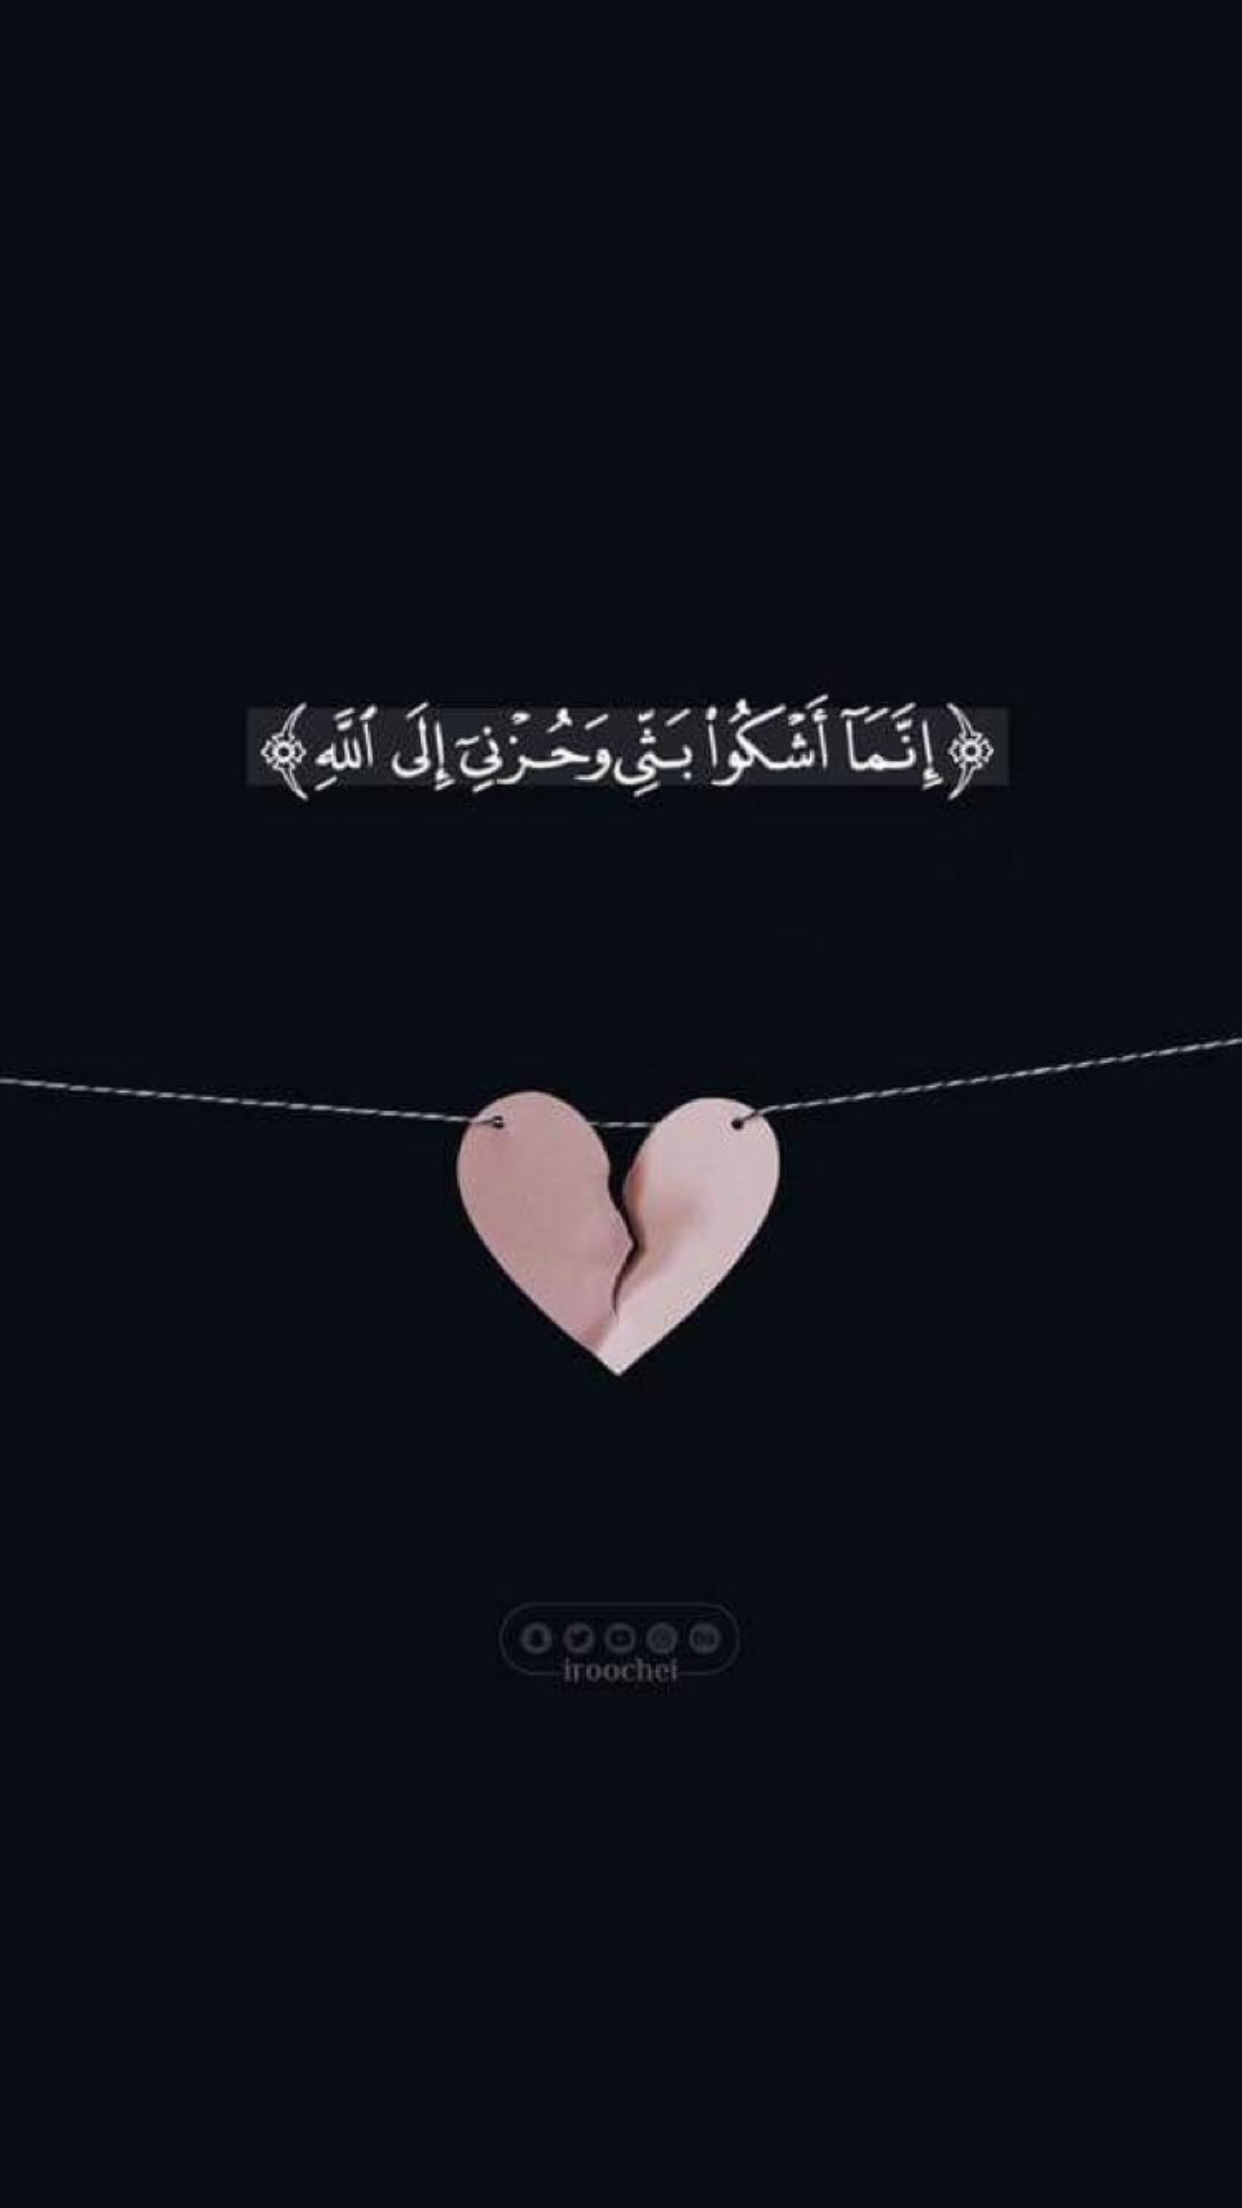 Pin By Asmaa Alamawy On اذكارات Quran Quotes Love Quran Quotes Quran Quotes Verses